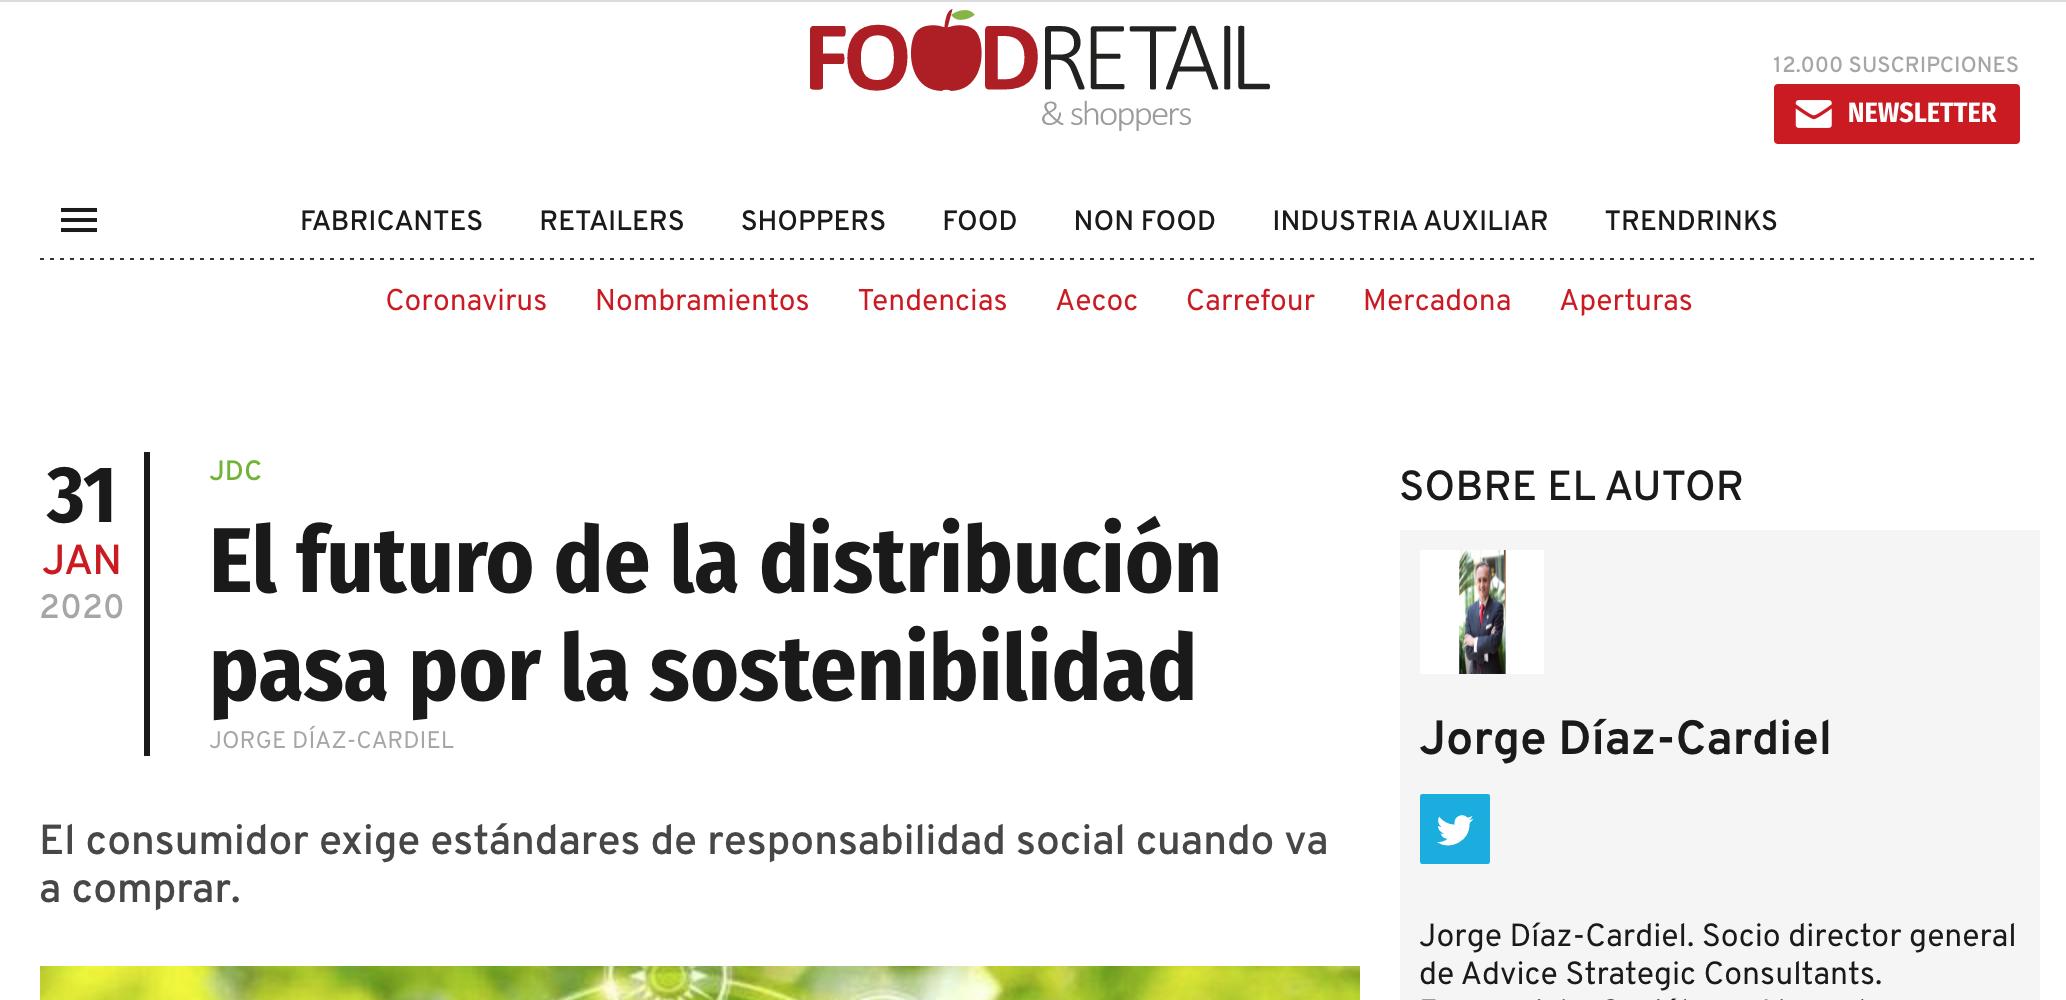 Article by Jorge Díaz-Cardiel in Food Retail